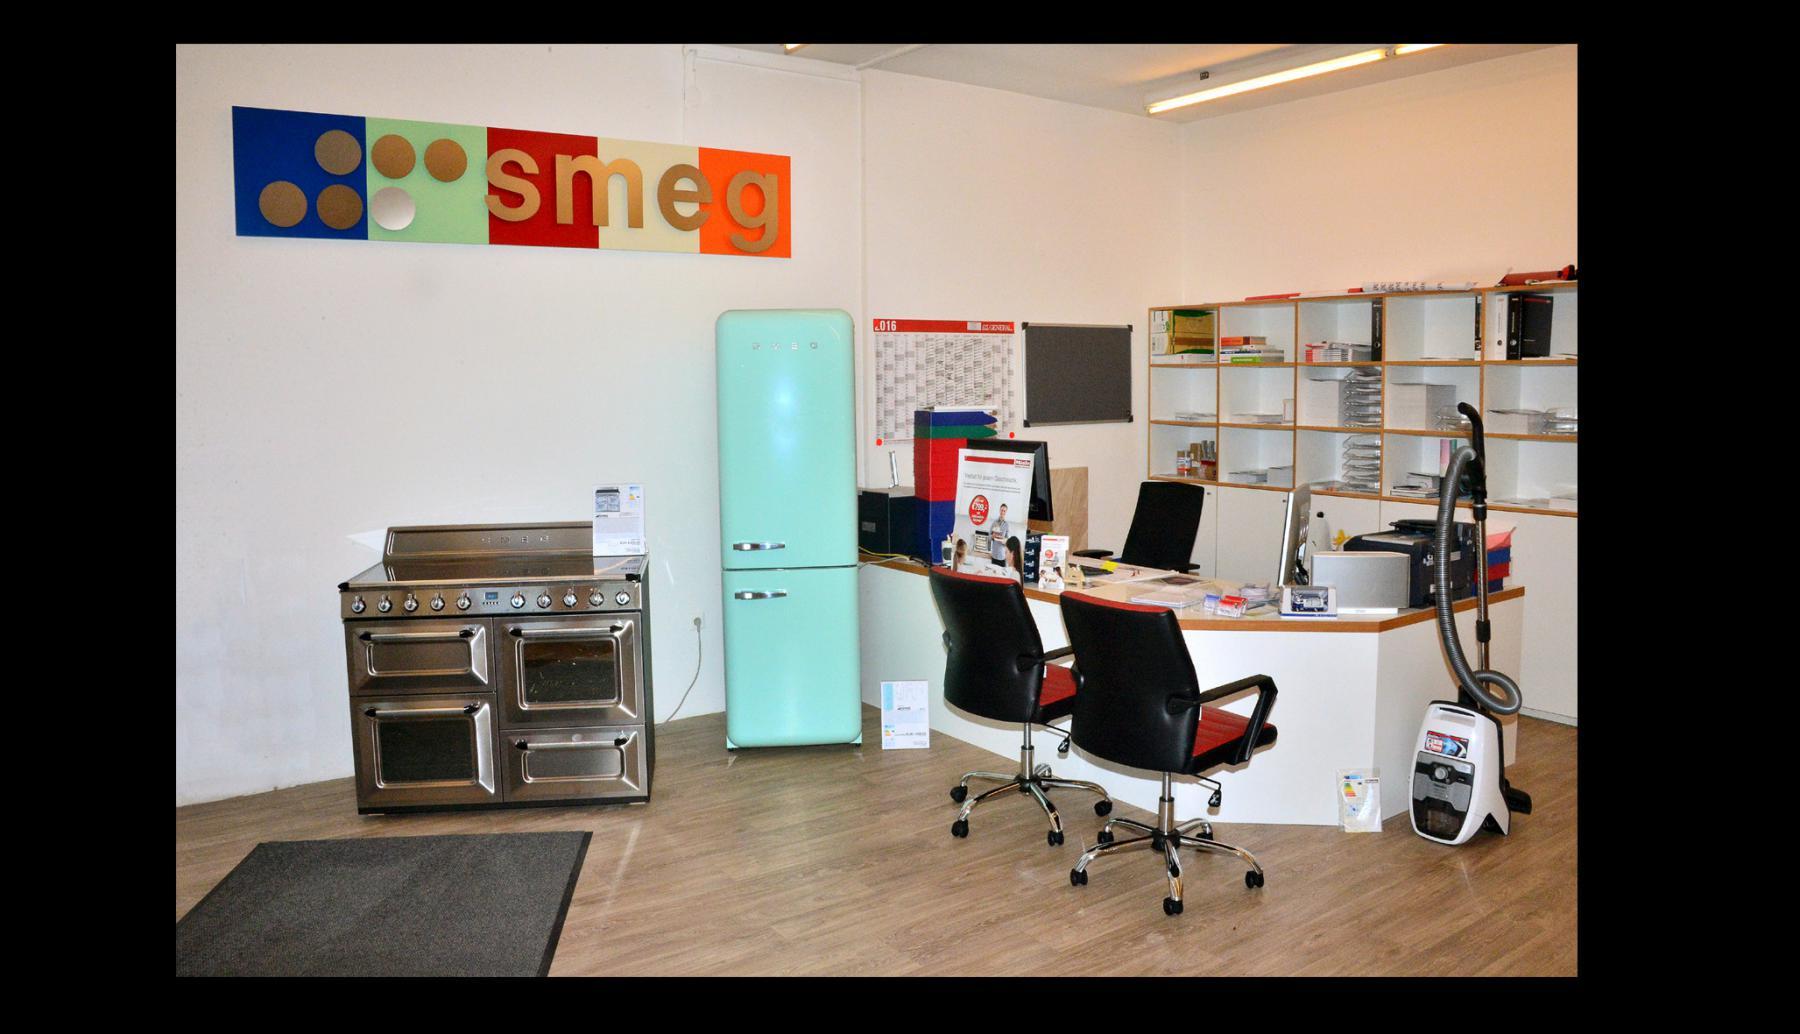 hausger te huber in regensburg karthauser stra e 8. Black Bedroom Furniture Sets. Home Design Ideas